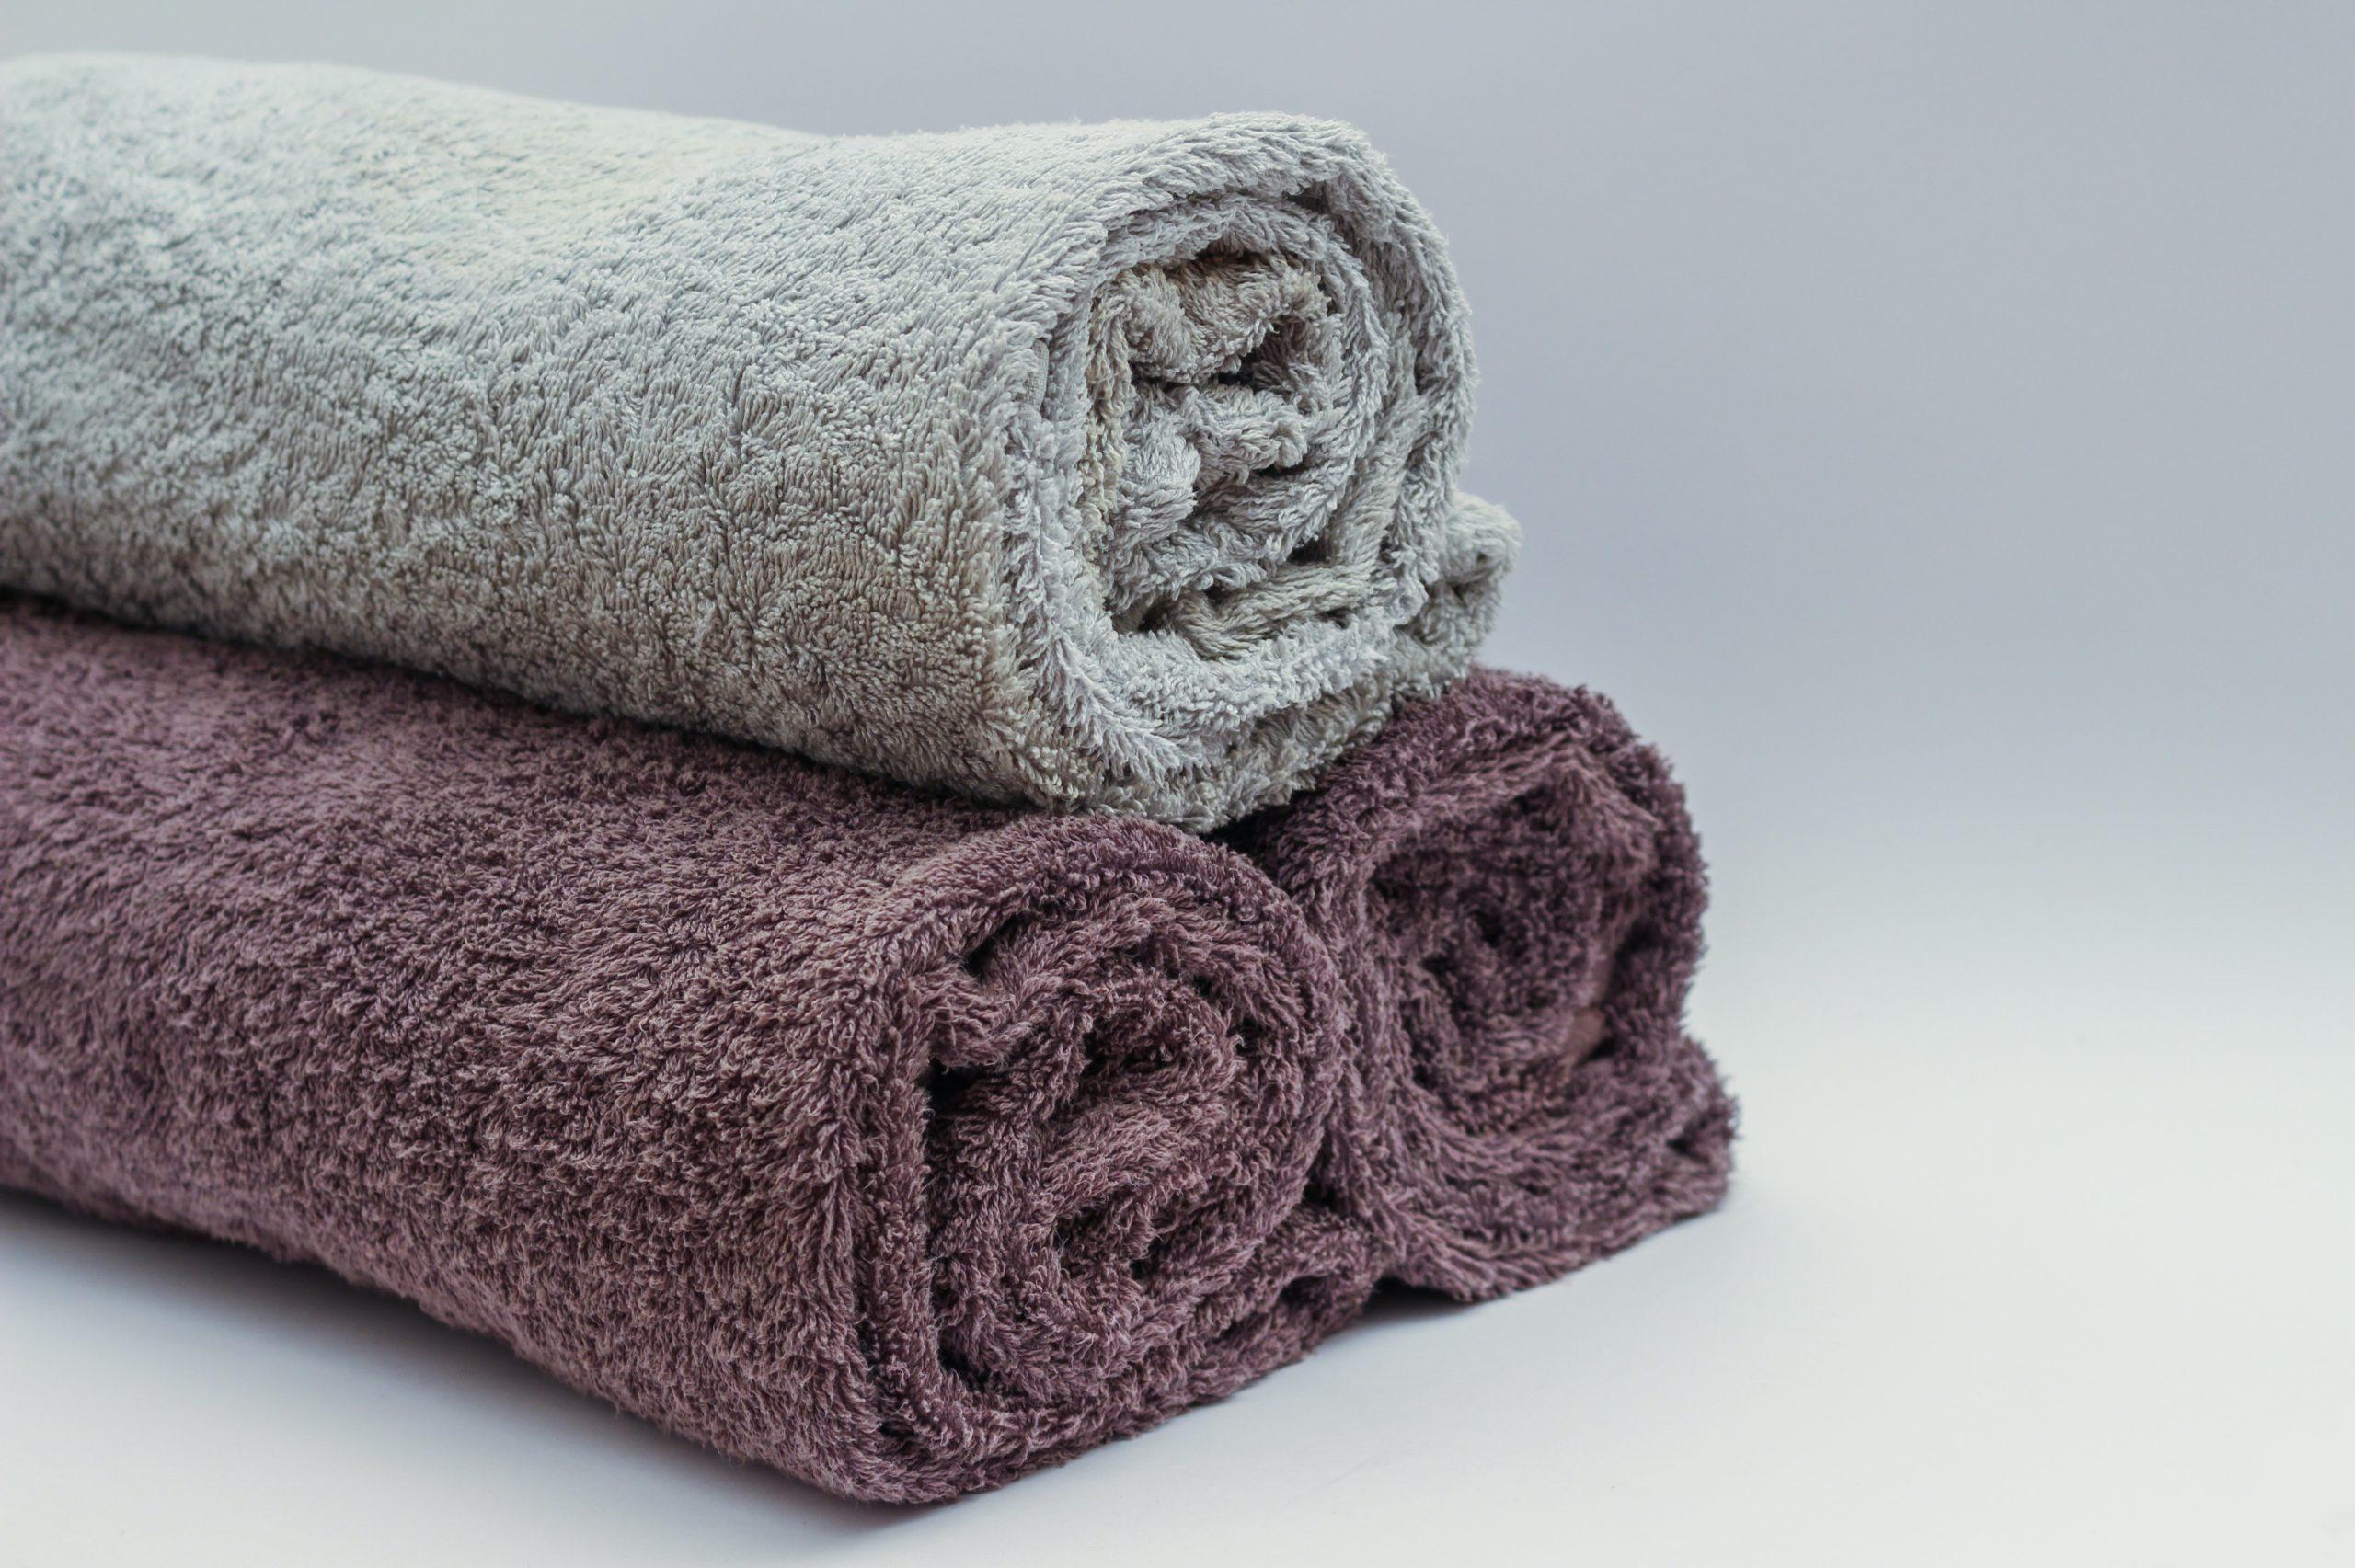 zachte handdoeken na wassen